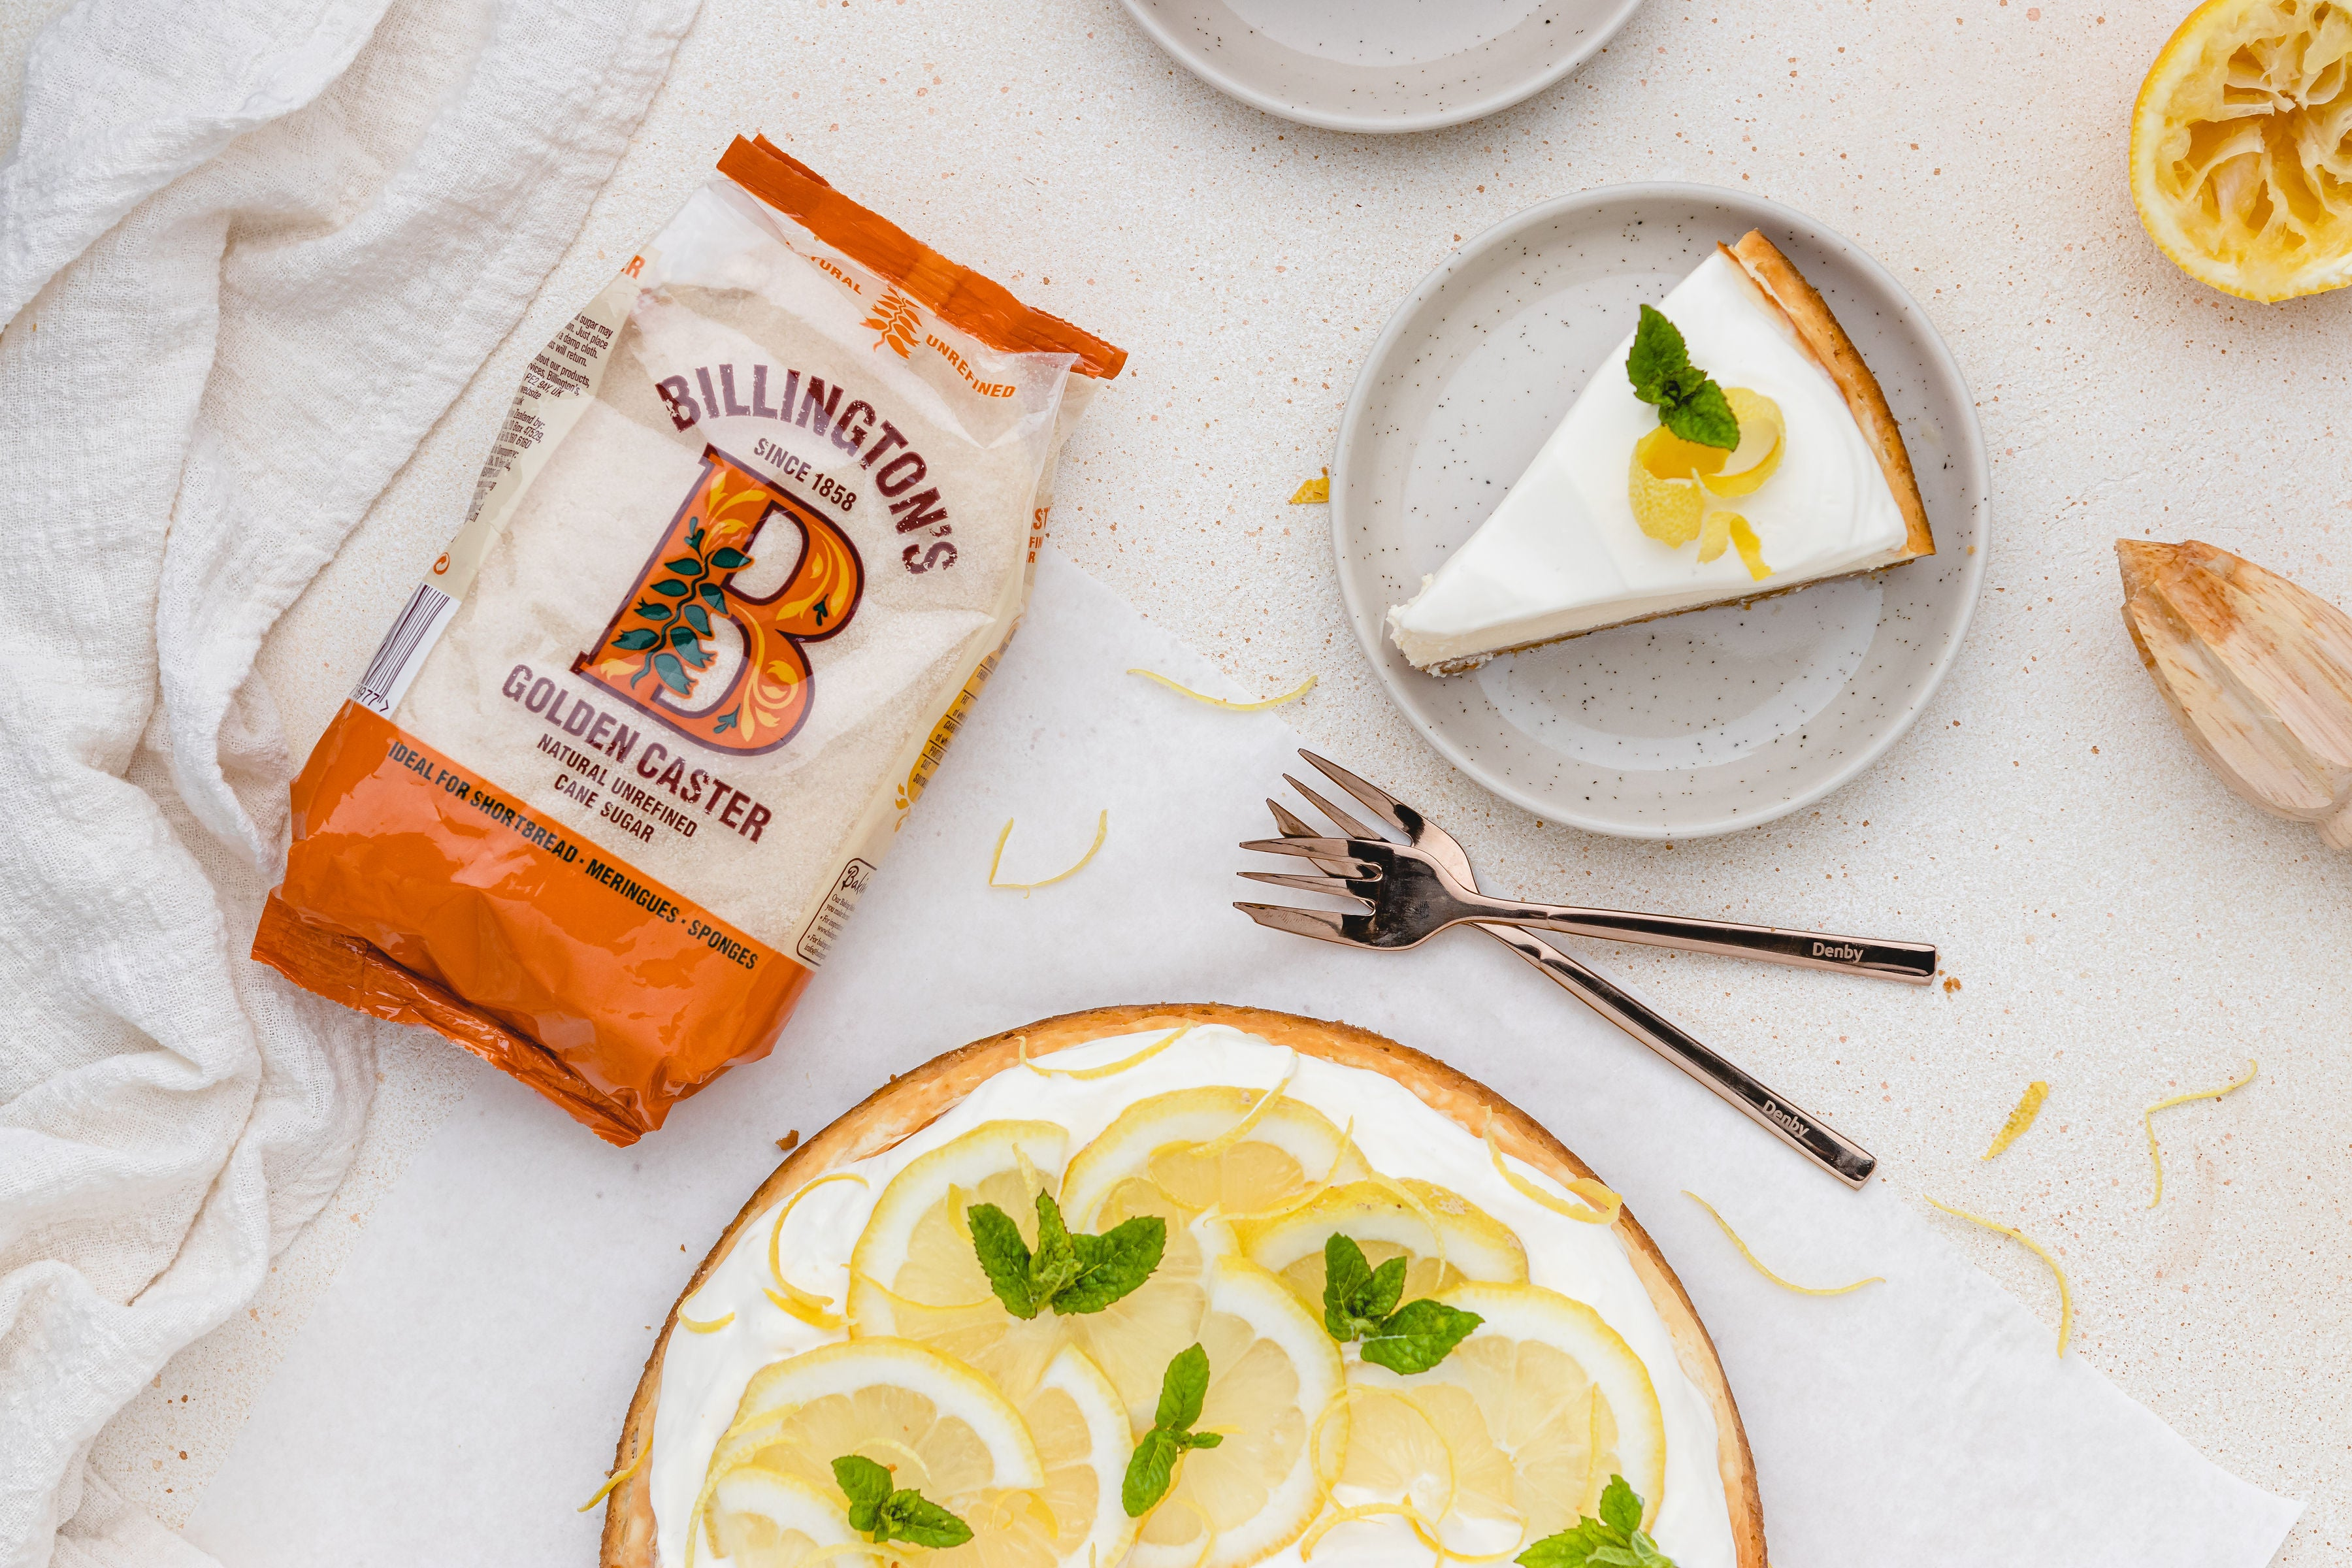 Slice of lemon cheesecake on plate, two forks and bag of sugar